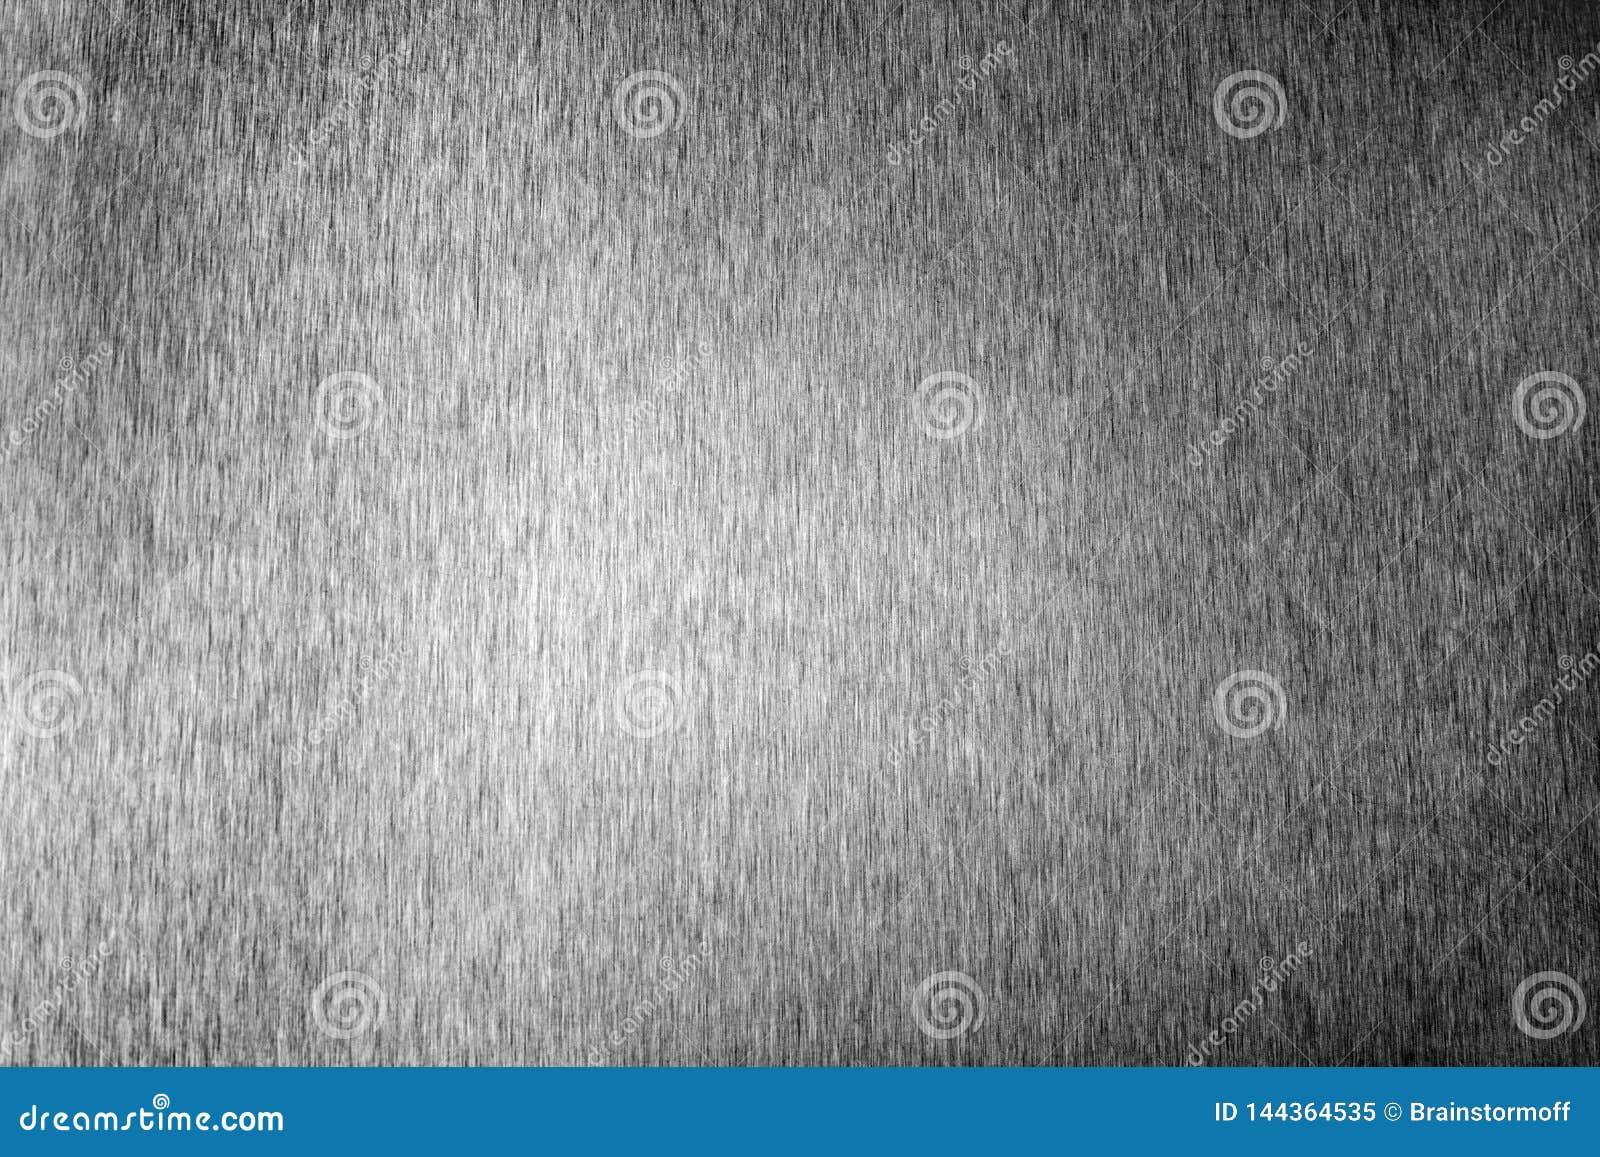 Silver metal shiny empty surface, monochrome shining metallic background, brushed black and white iron sheet backdrop close up